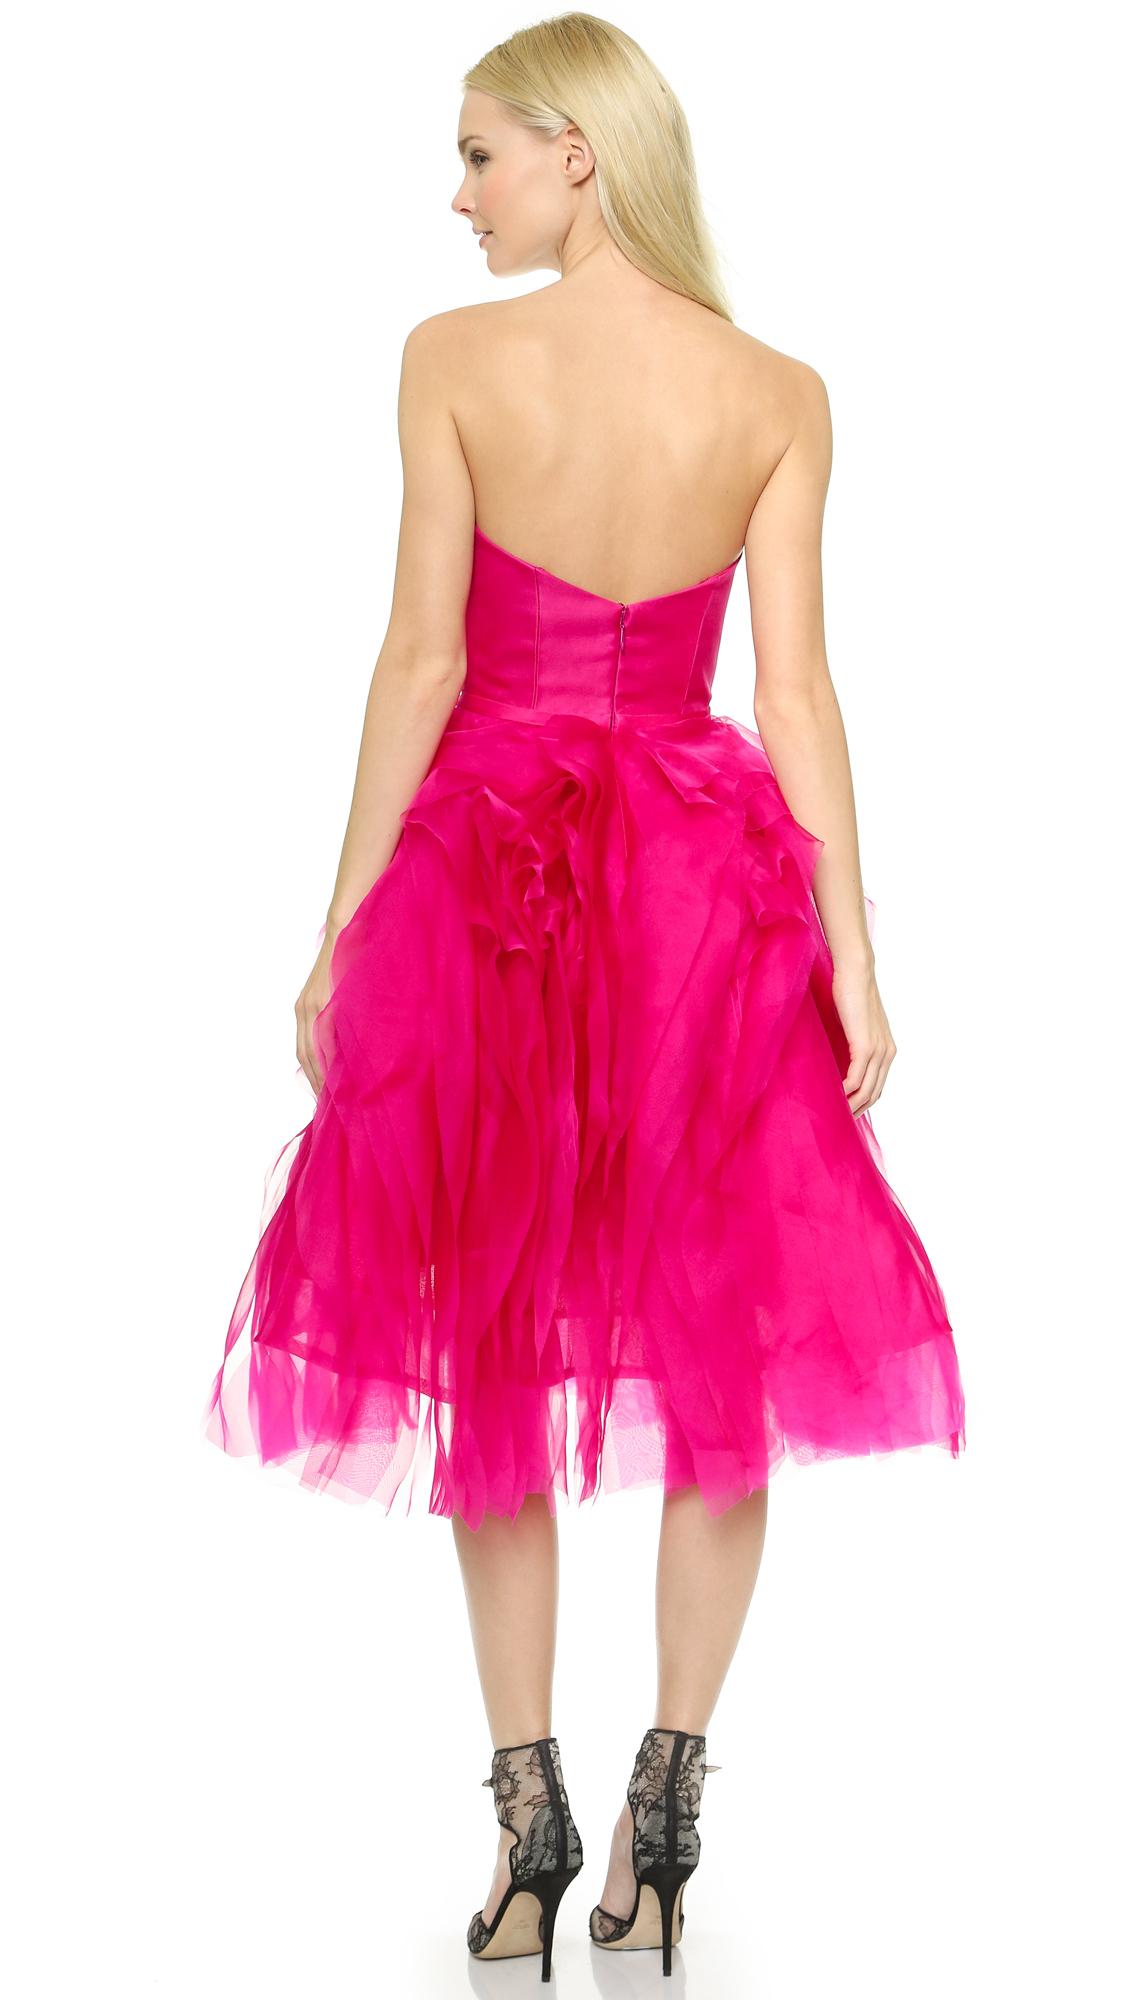 Lujoso Monique Lhuillier Vestidos De Baile Ornamento - Colección de ...